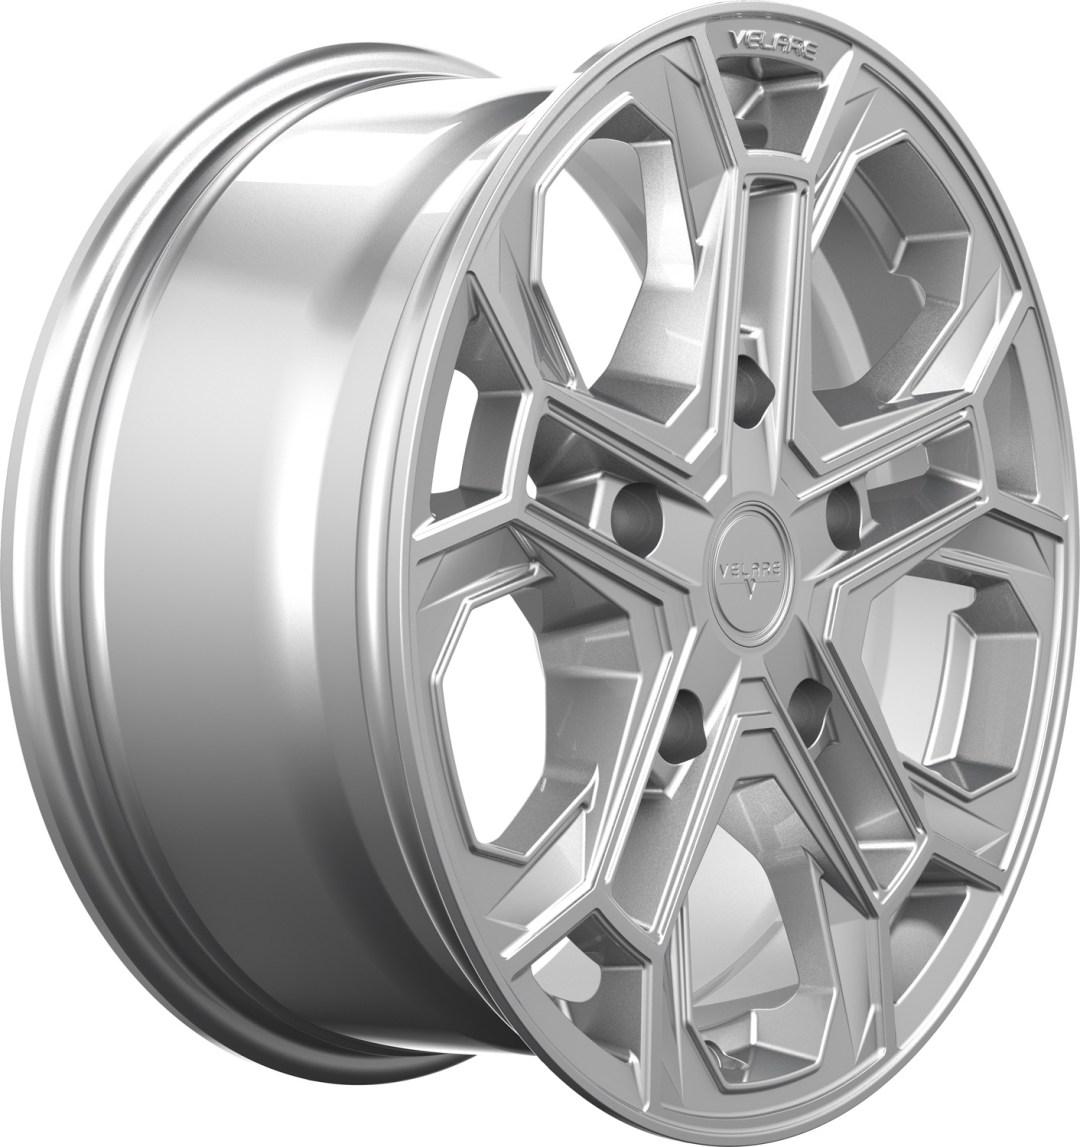 Velare VLR ST Iridium Silver 3